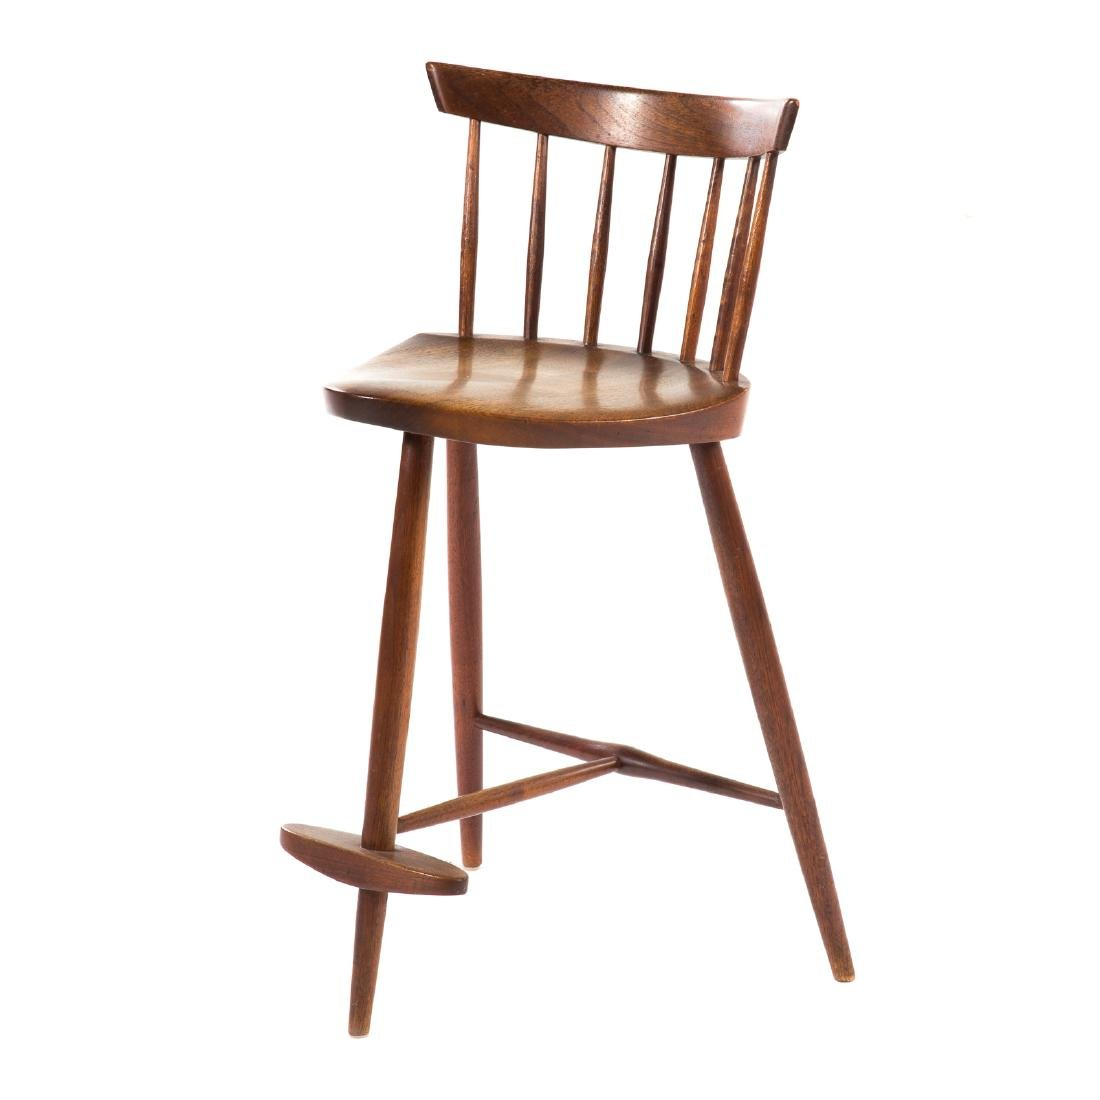 George Nakashima High Mira Chair - 2